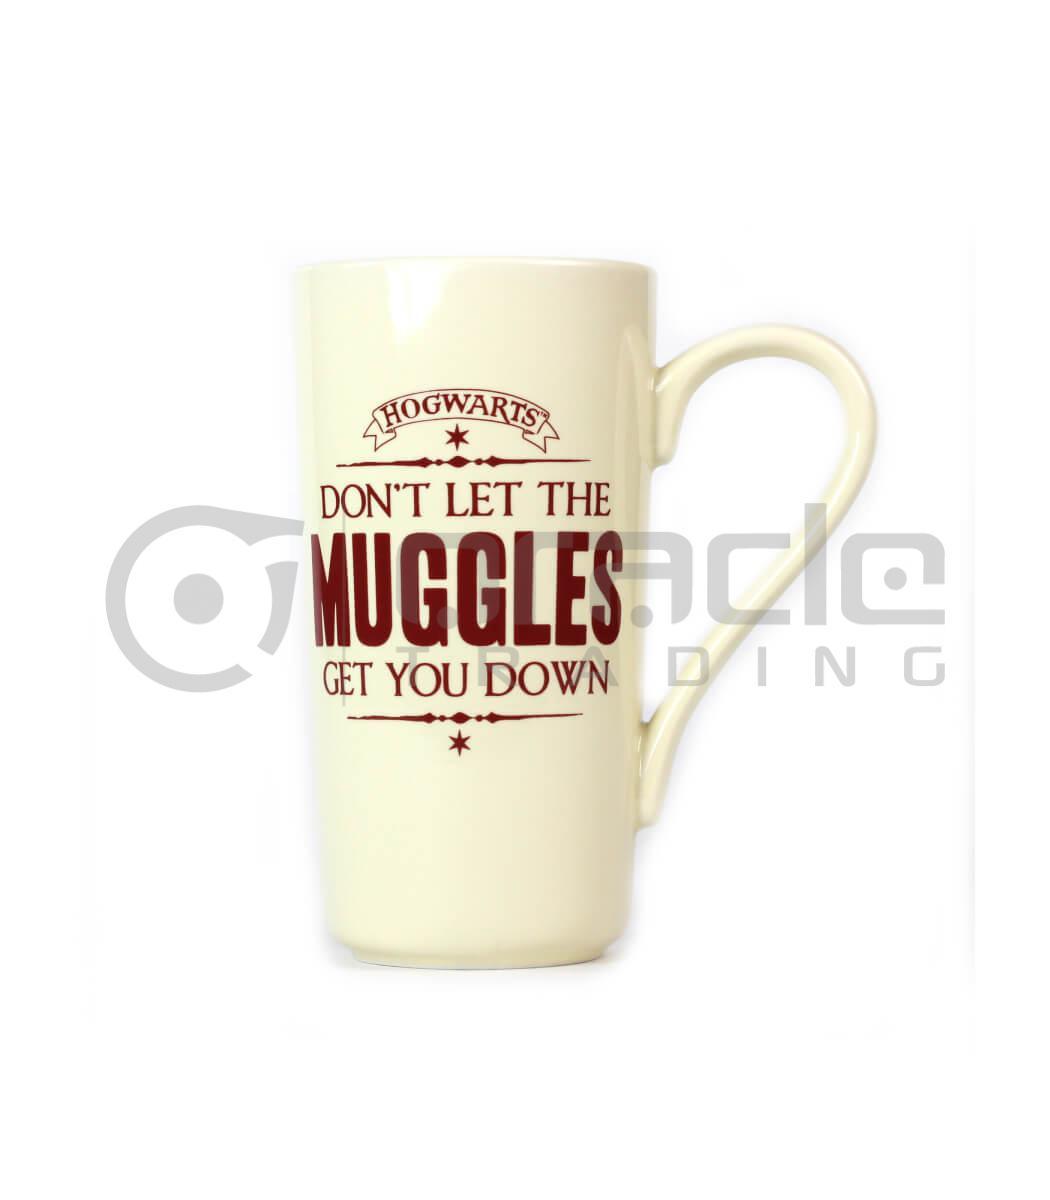 Harry Potter Tall Mug - Muggles